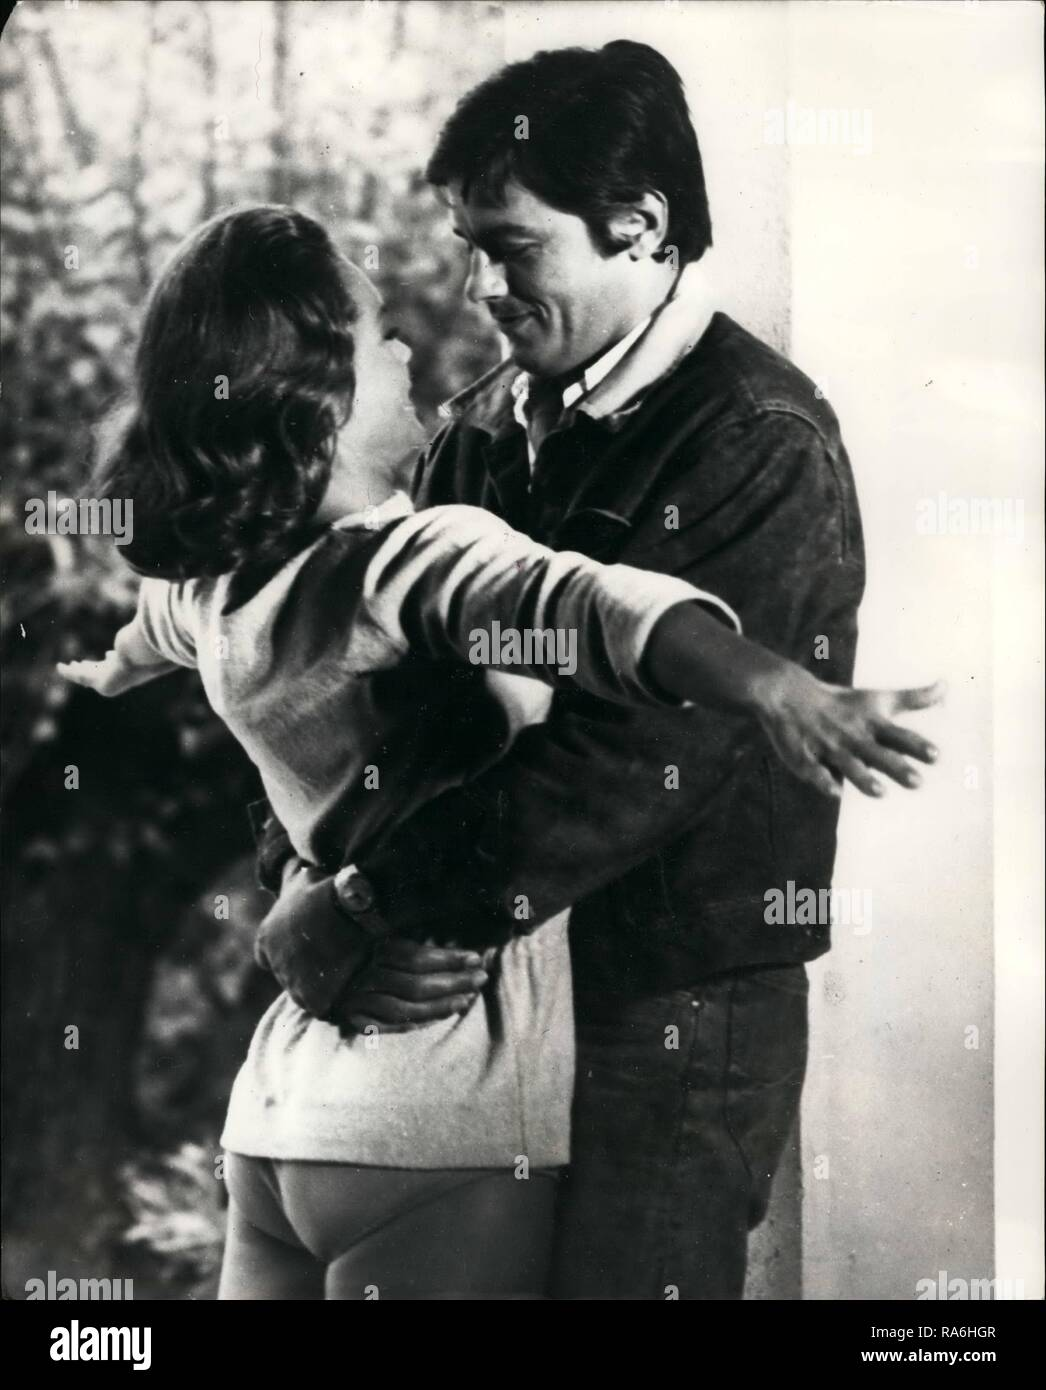 1963 Their Fist Kiss Since 1963 Actress Romy Schneider Was